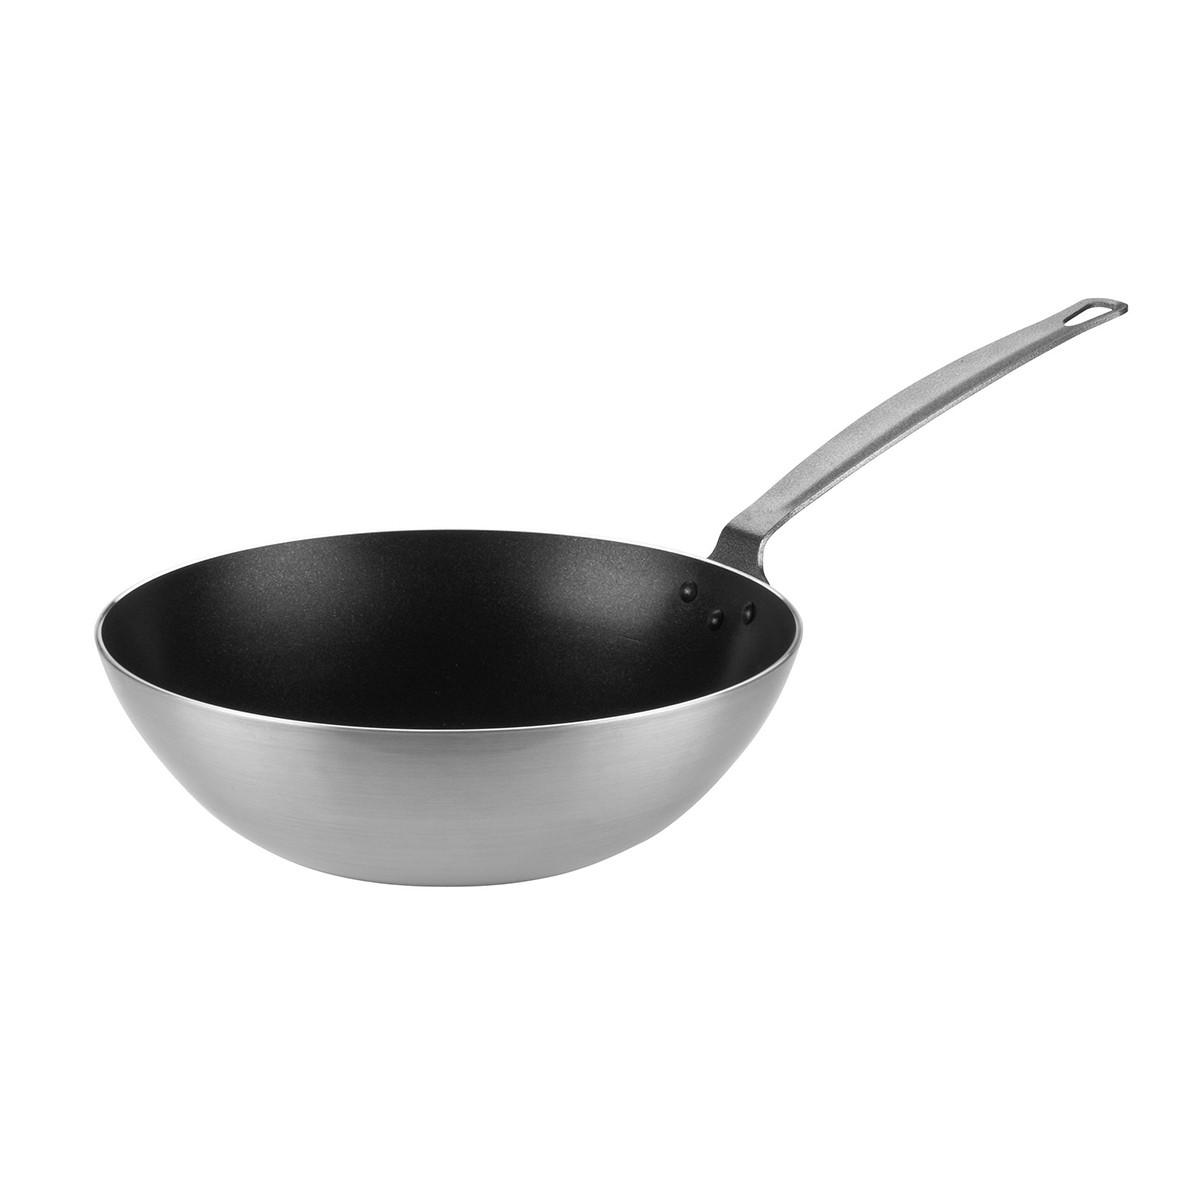 Сковорода WOK з антипригарним покриттям HLS 28см (7798Т)